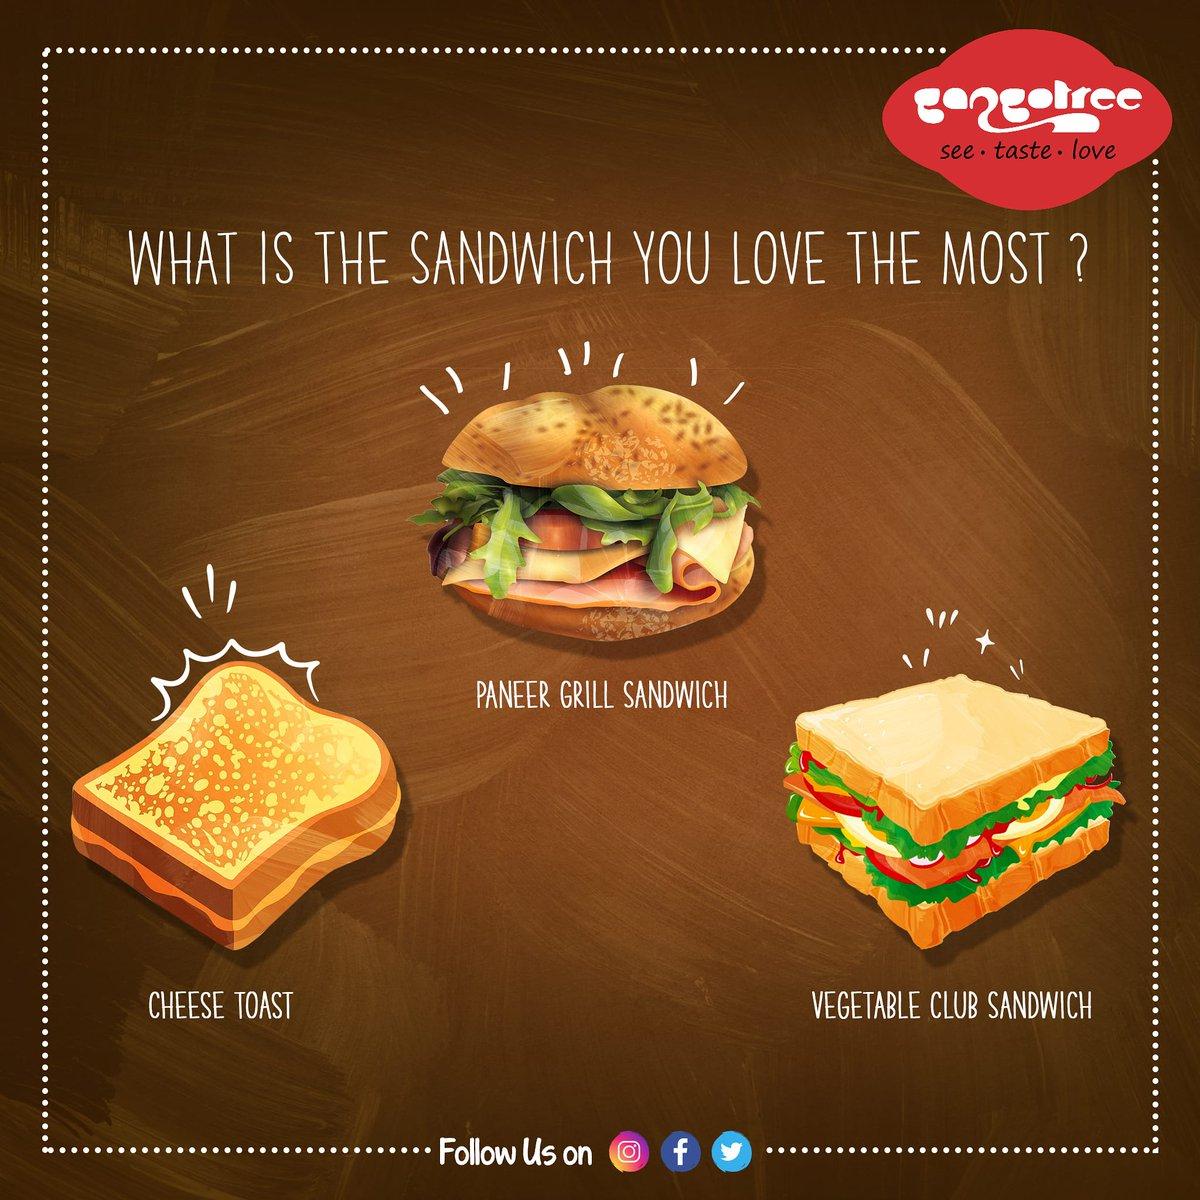 Which one you loved the most?   Call us 98848-84444 | @GangotreeSweets  We are available on Swiggy!  #ThinkGangotree #sandwich #Cravings #chennaibloggers #chennaiexpress #chennaifoodie #soChennai #WhereChennaiEats #tasty #foodtalkindia #eeeeeats #foodstagram #eveningsnackspic.twitter.com/h2jSrQQxrM